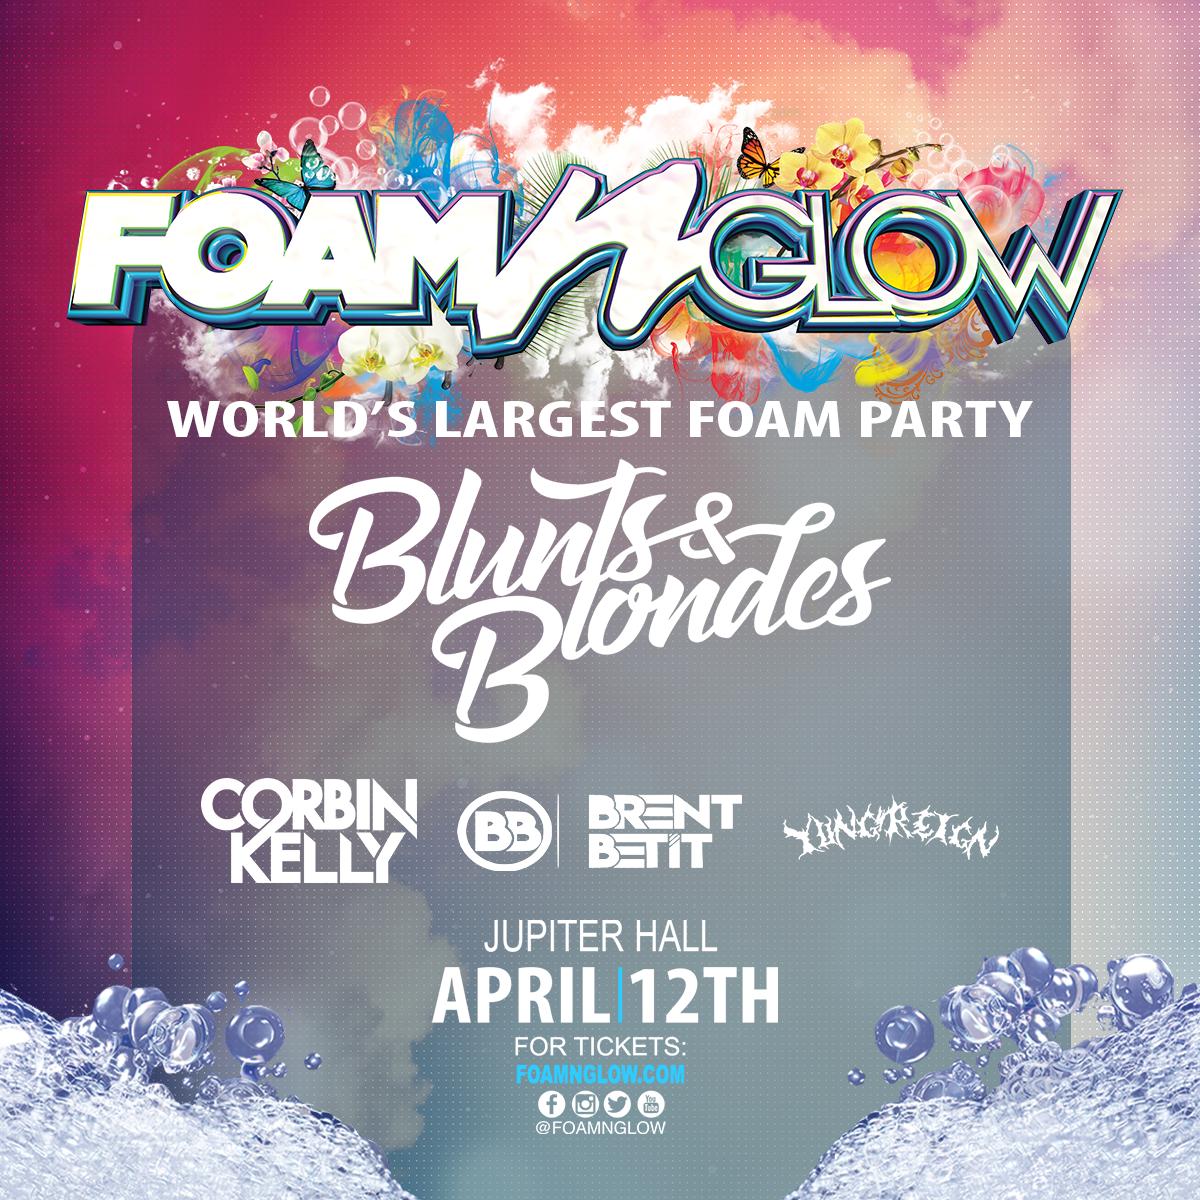 Foam N' Glow Albany NY Flyer Spring 2019